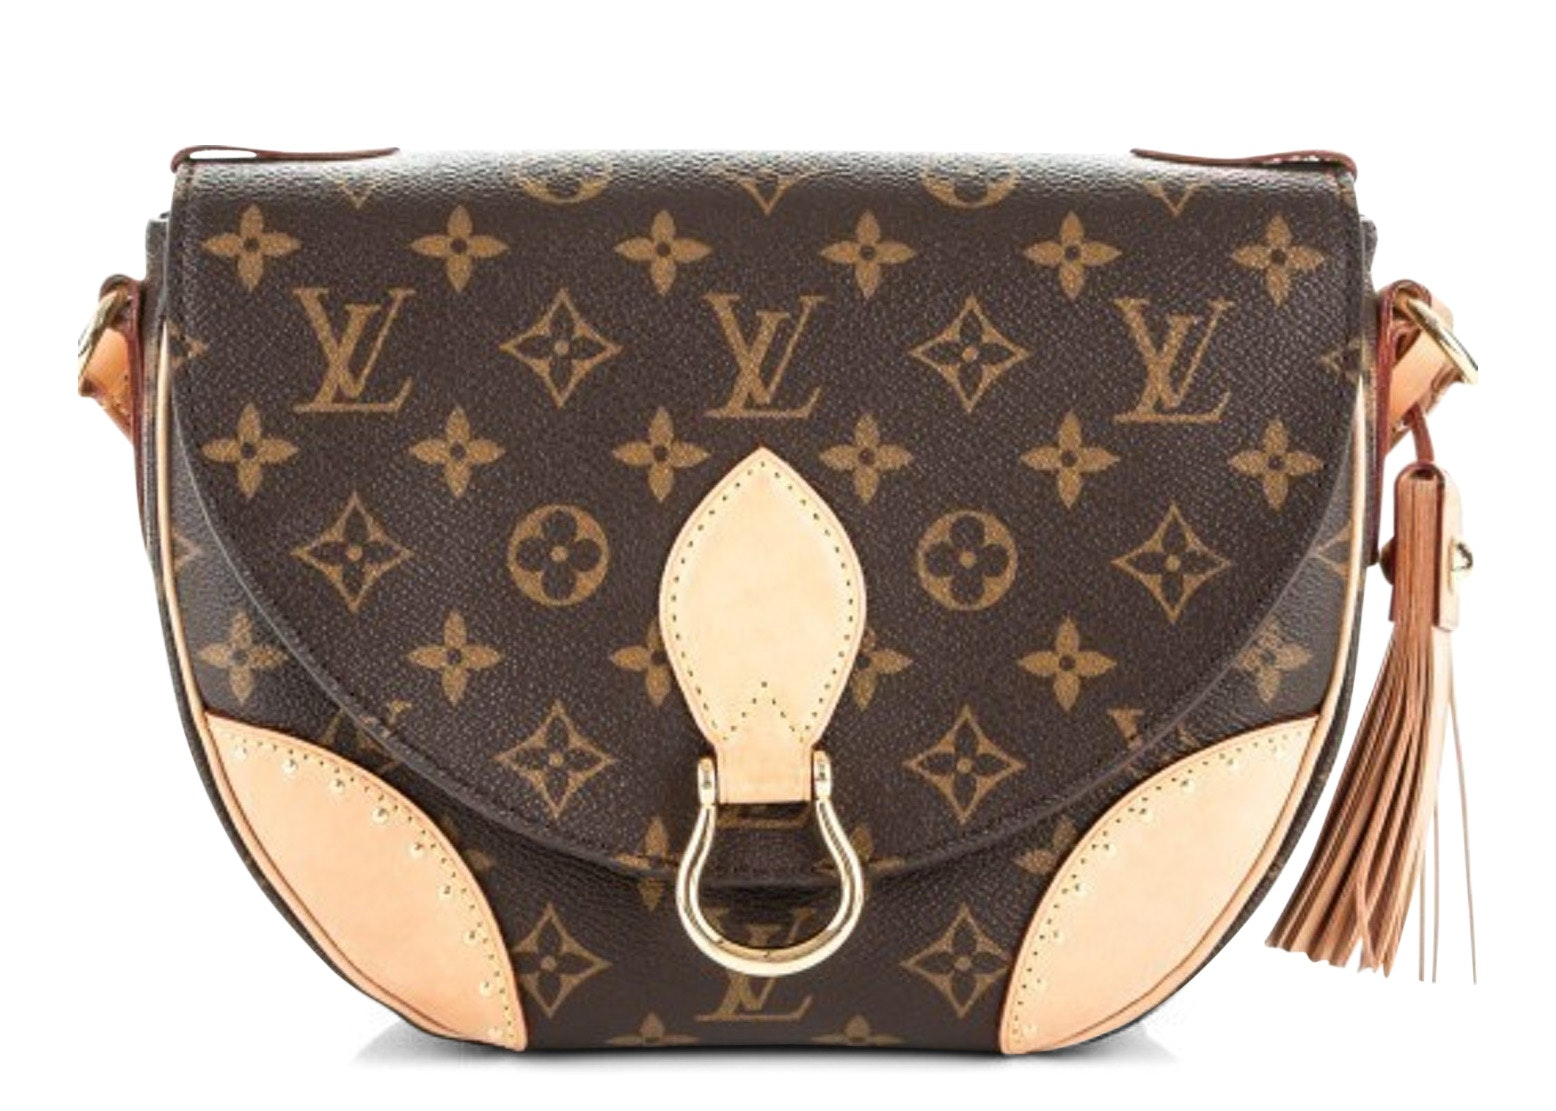 Louis Vuitton Saint Cloud NM Monogram Brown